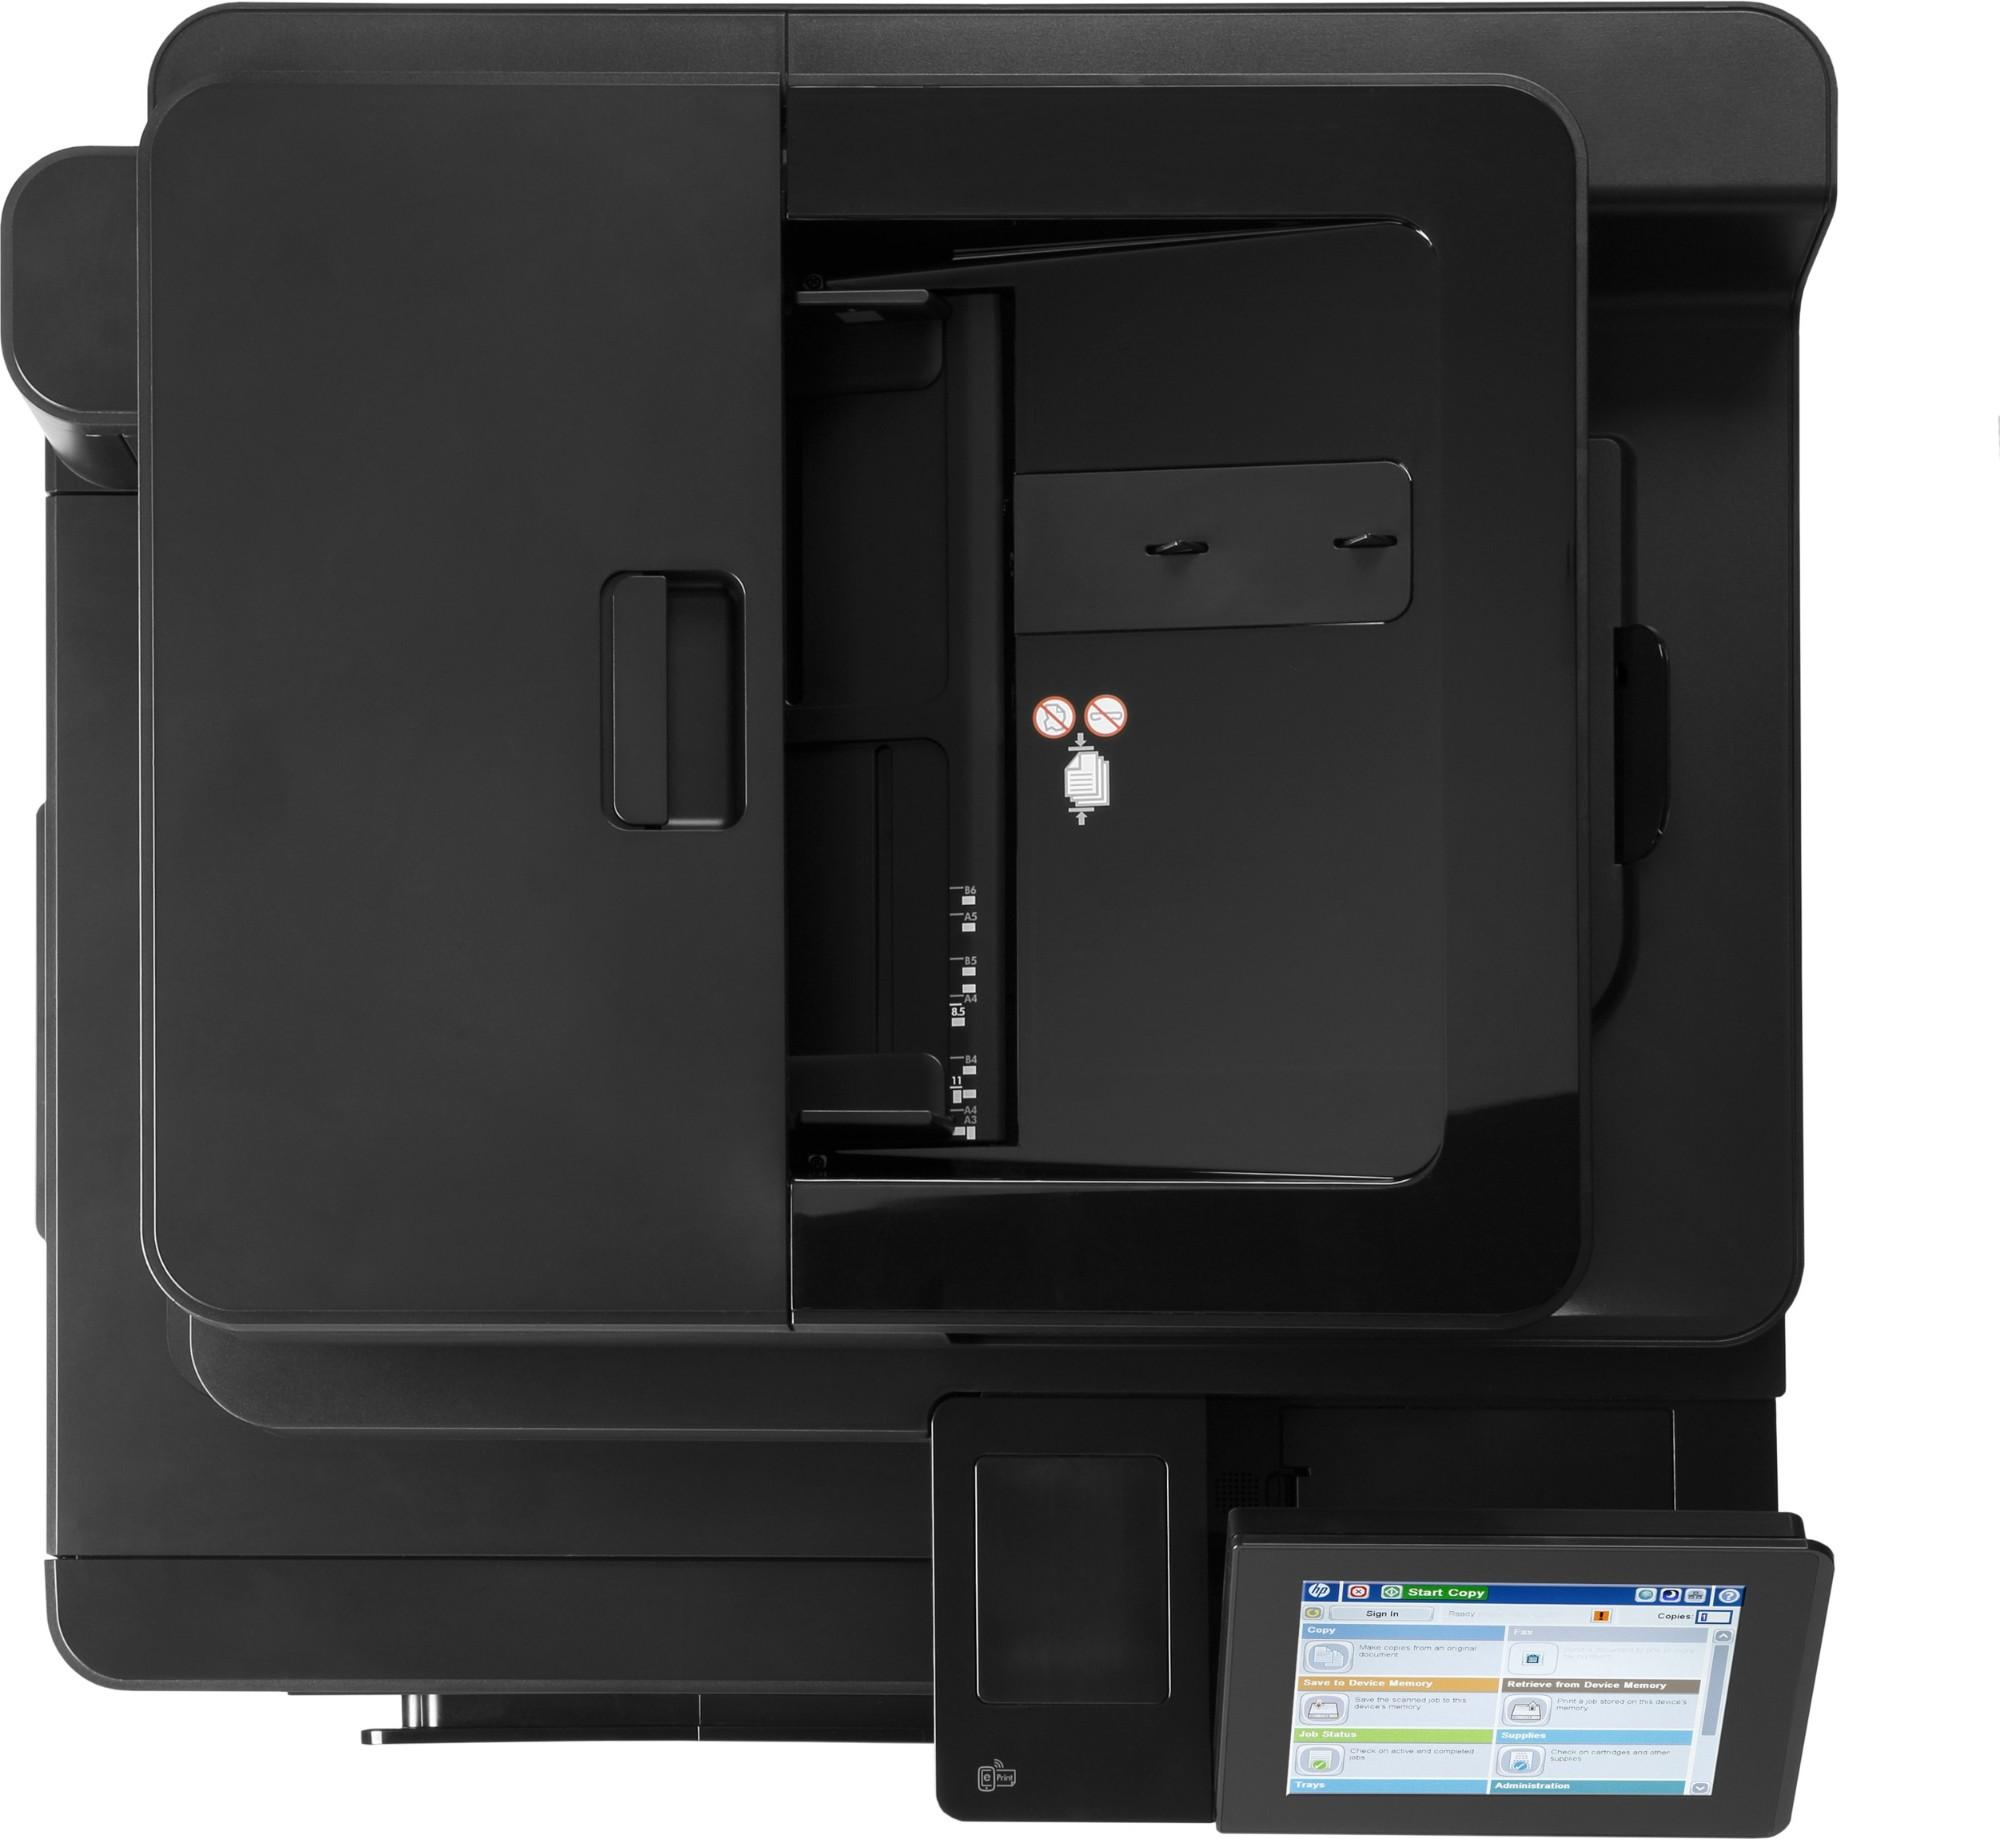 HP LaserJet Enterprise flow M880z Laser 46 ppm 1200 x 1200 DPI A3